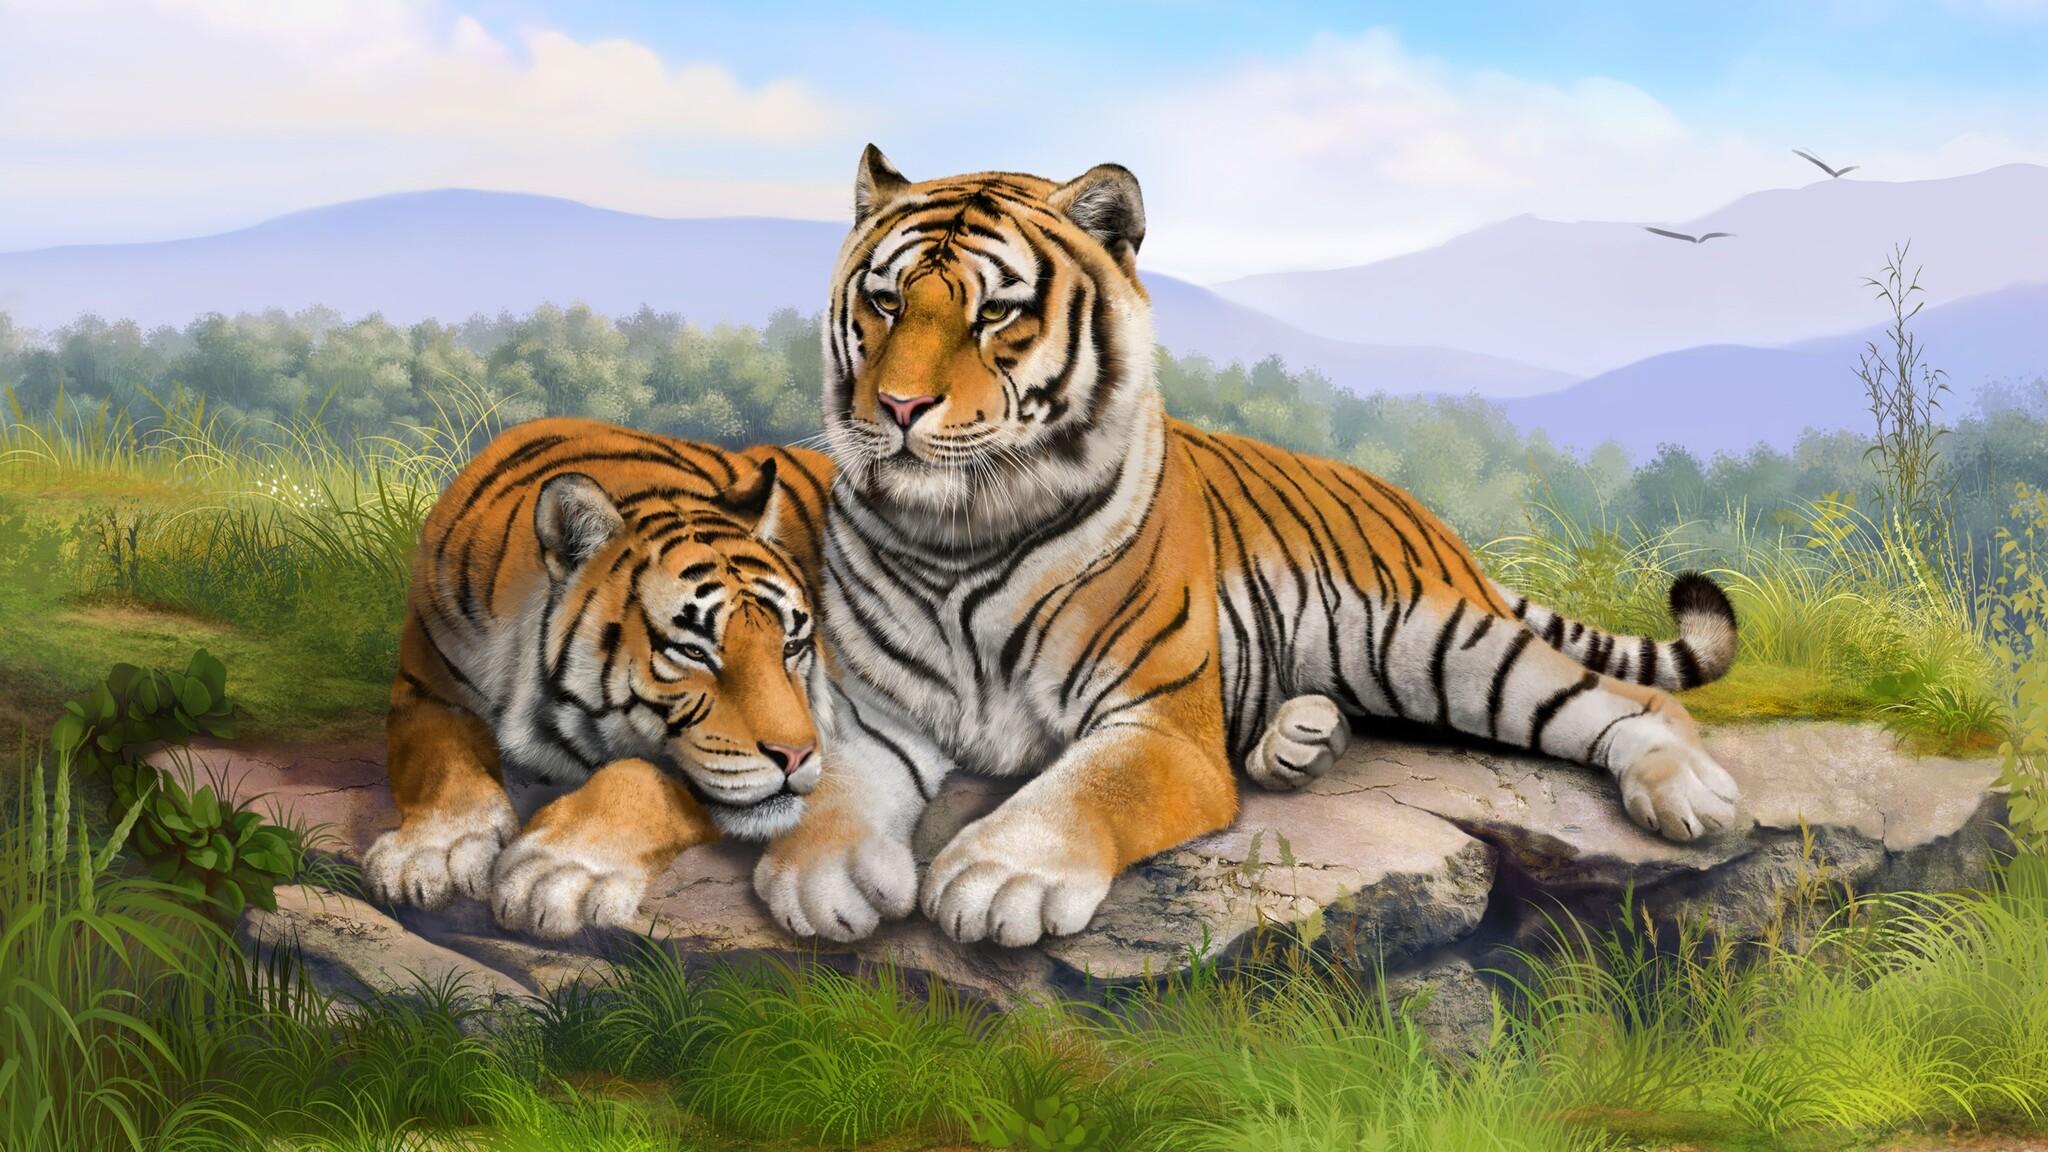 Cute Bengal Wallpapers Hd 1366x768 2048x1152 Tigers Art 2048x1152 Resolution Hd 4k Wallpapers